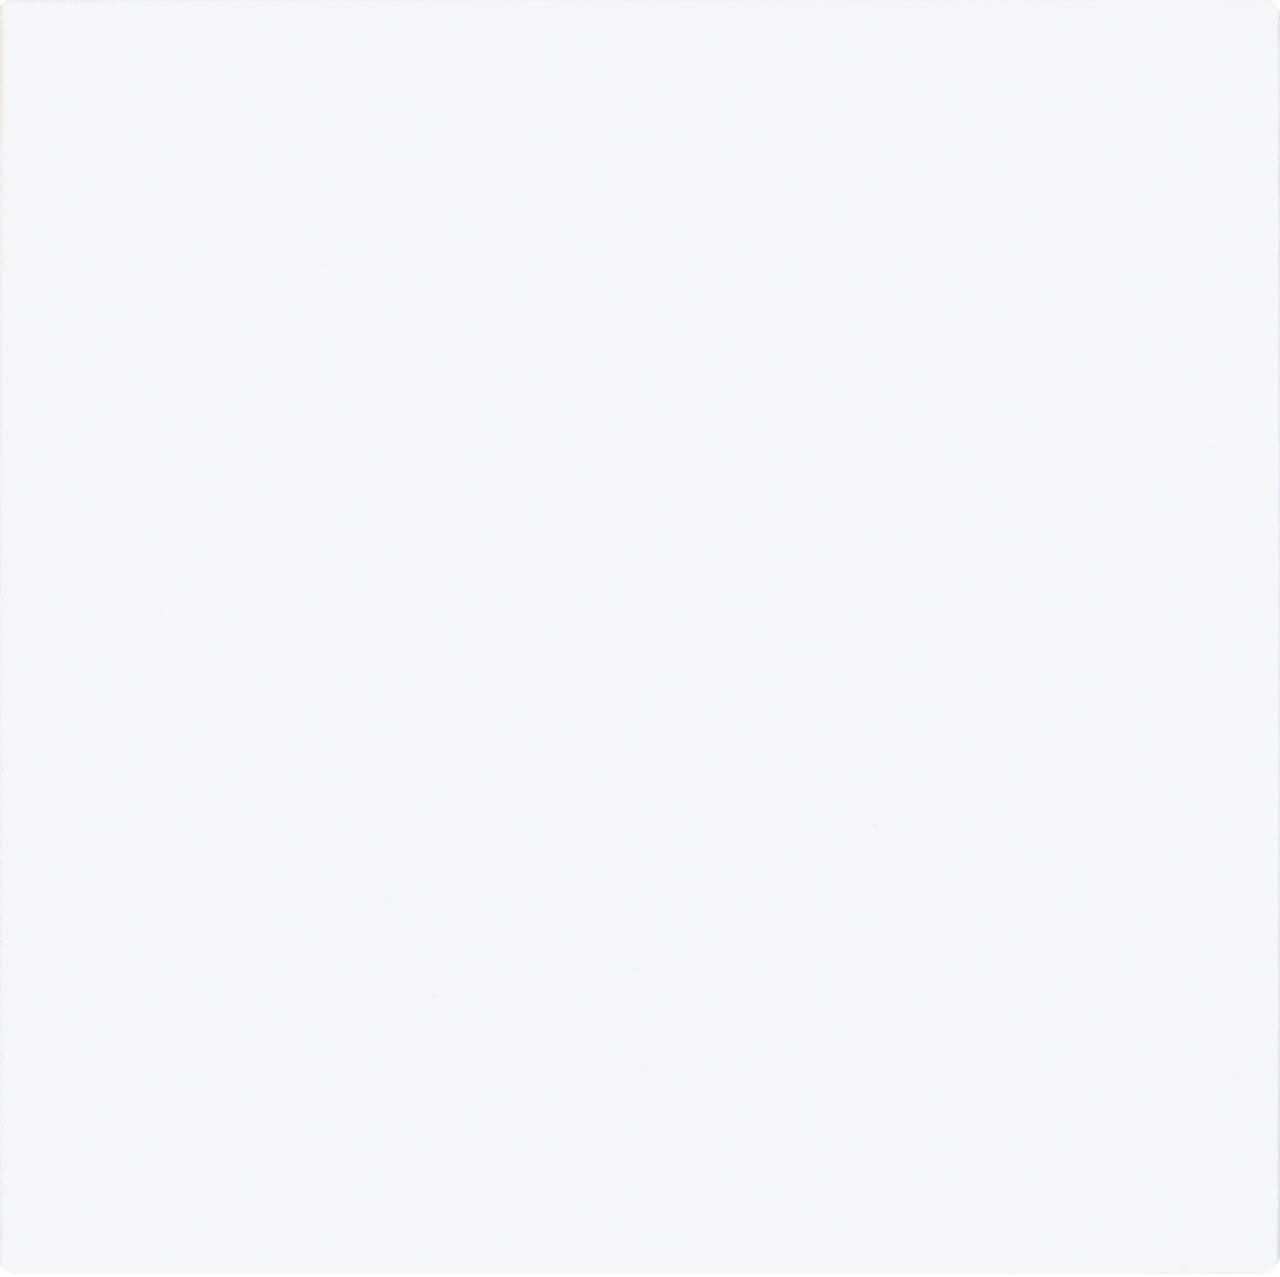 Revestimento Branco Piscina A 15,5x15,5cm Caixa 1,50m² Branco Eliane